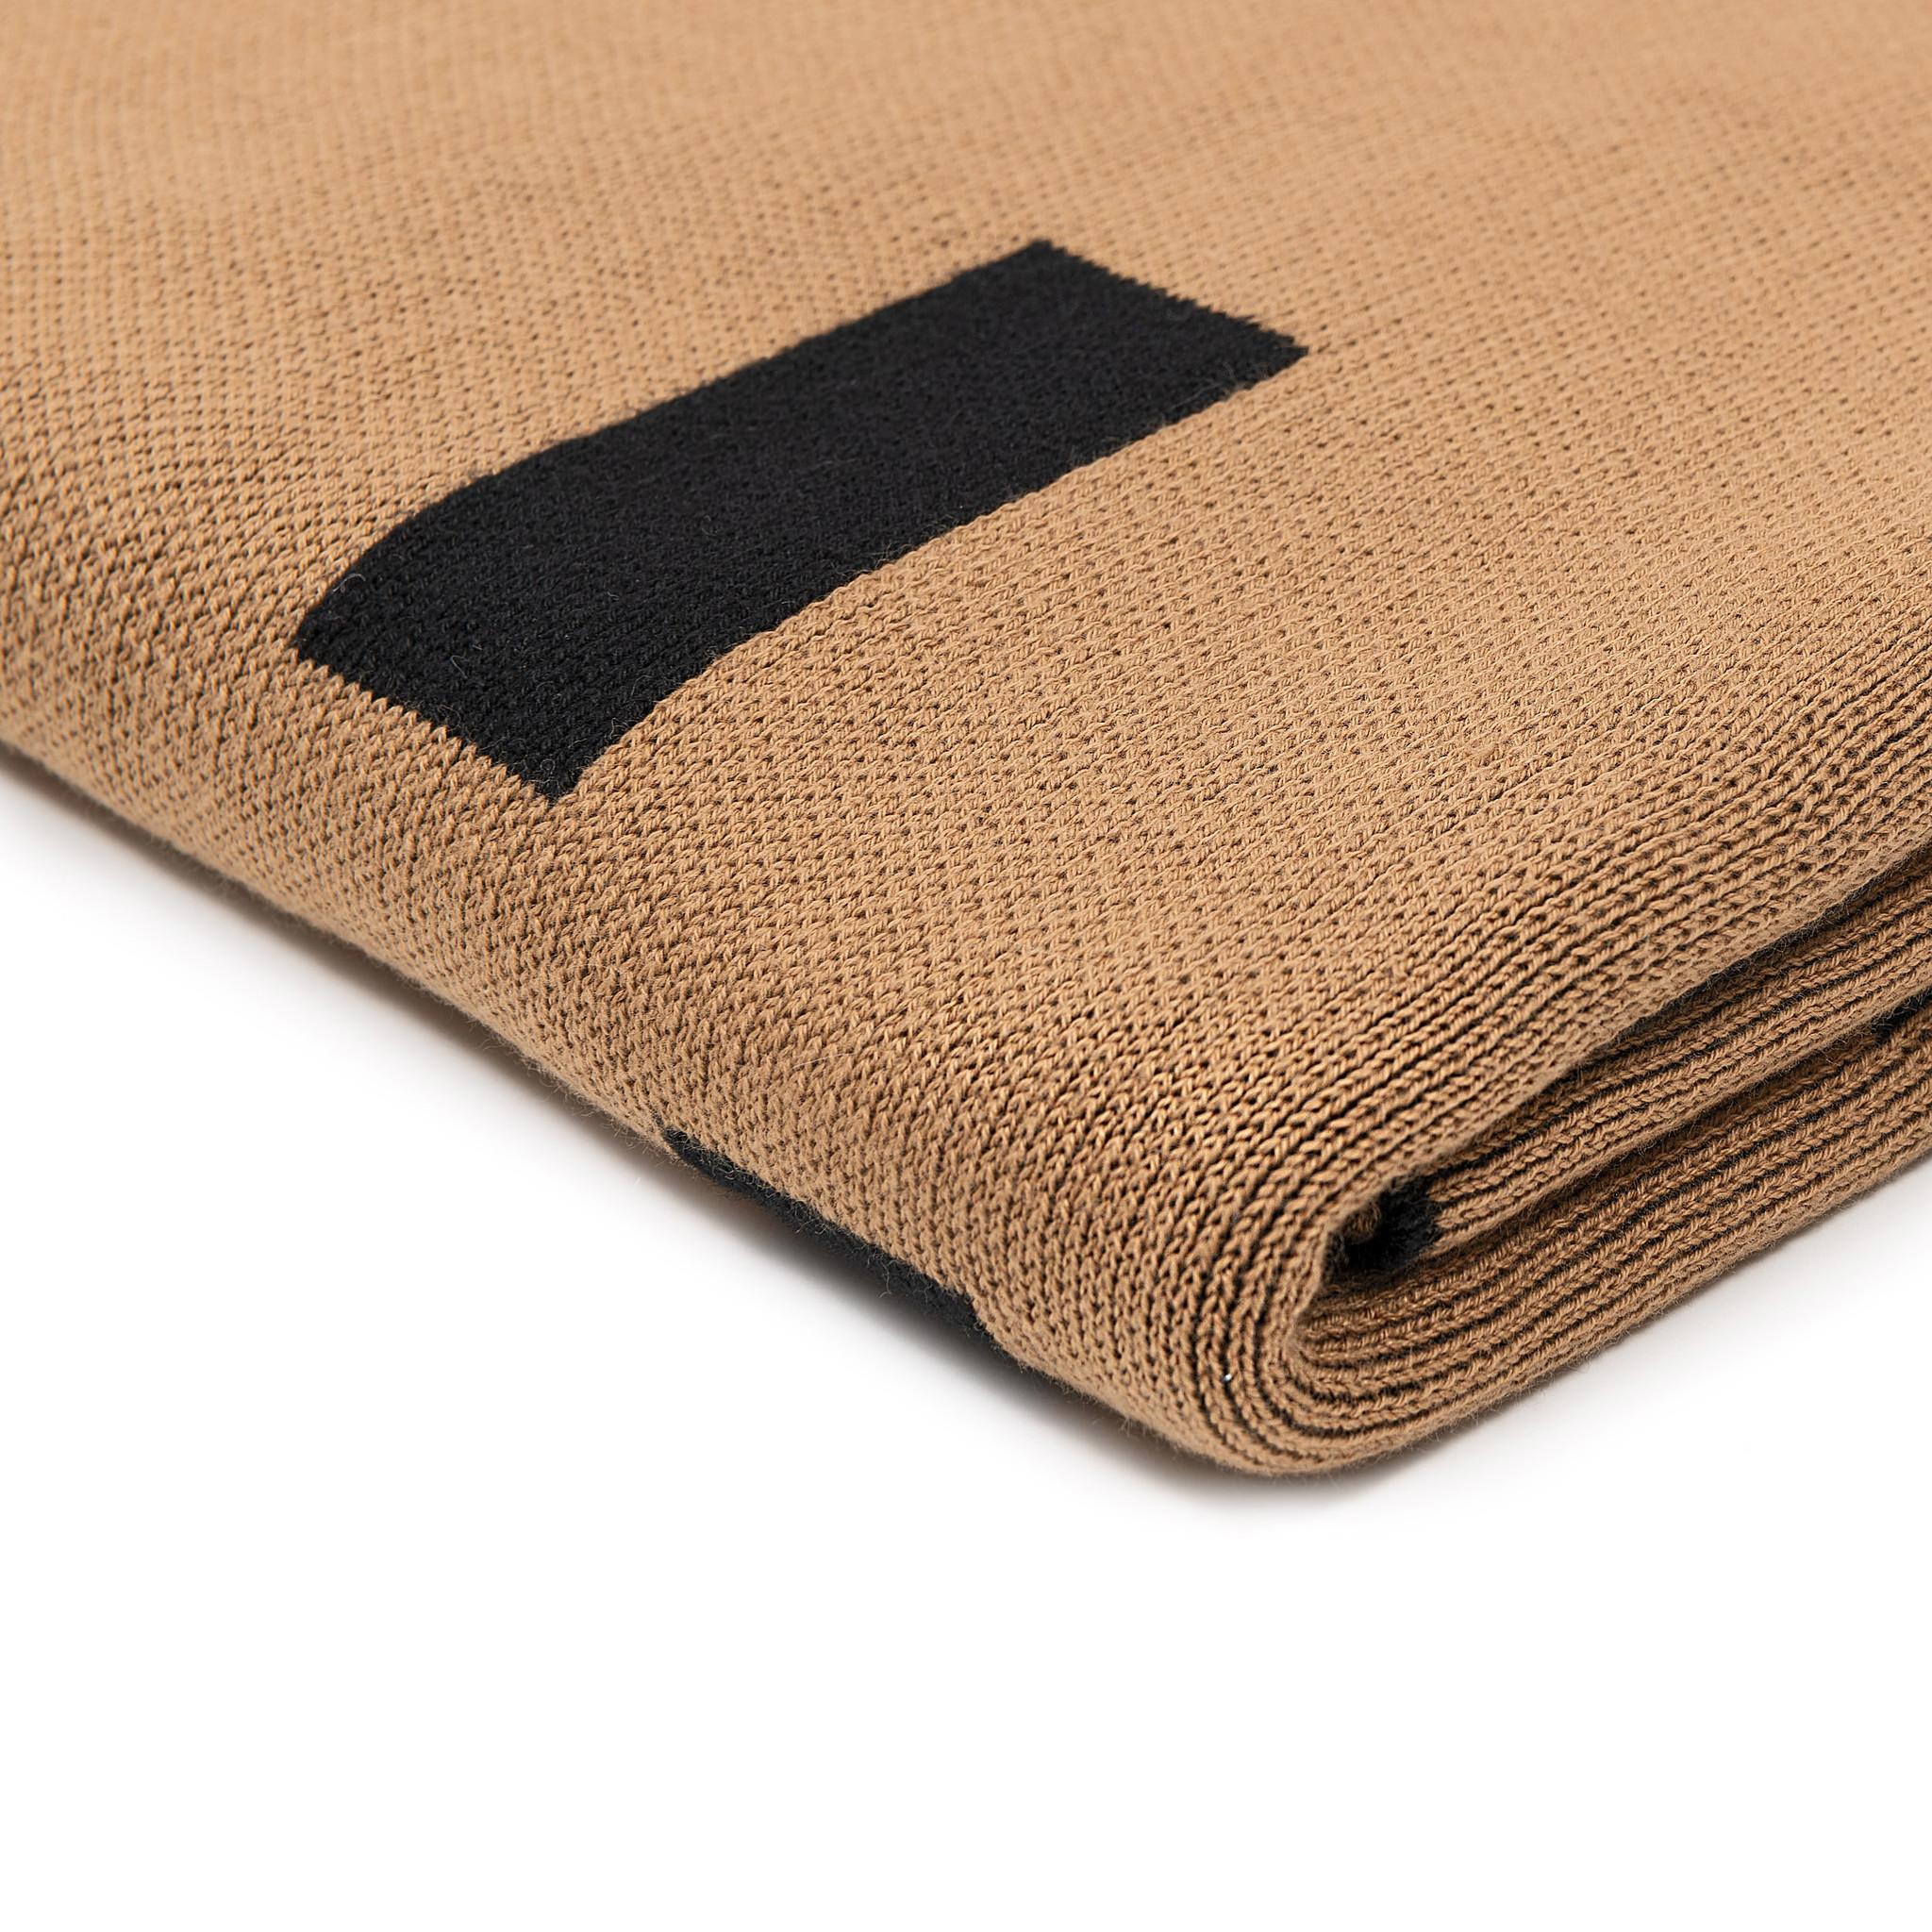 Scarf cotton Mondriaan camel black